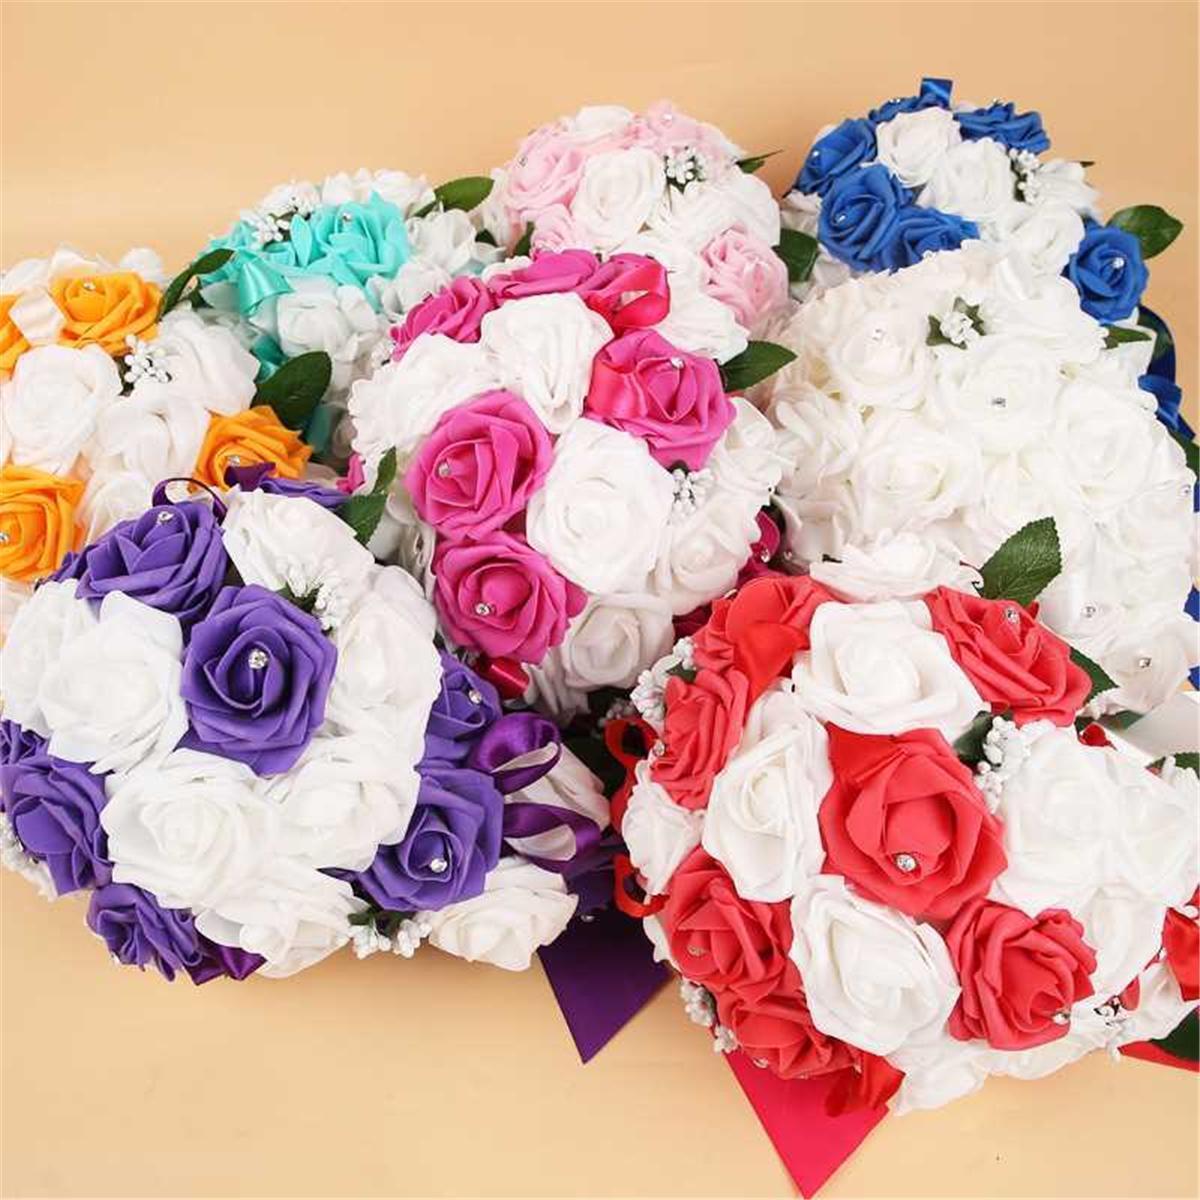 Bridesmaid Wedding Flowers Ivory Rose Pink Bouquet Bride Flower Girl Wand